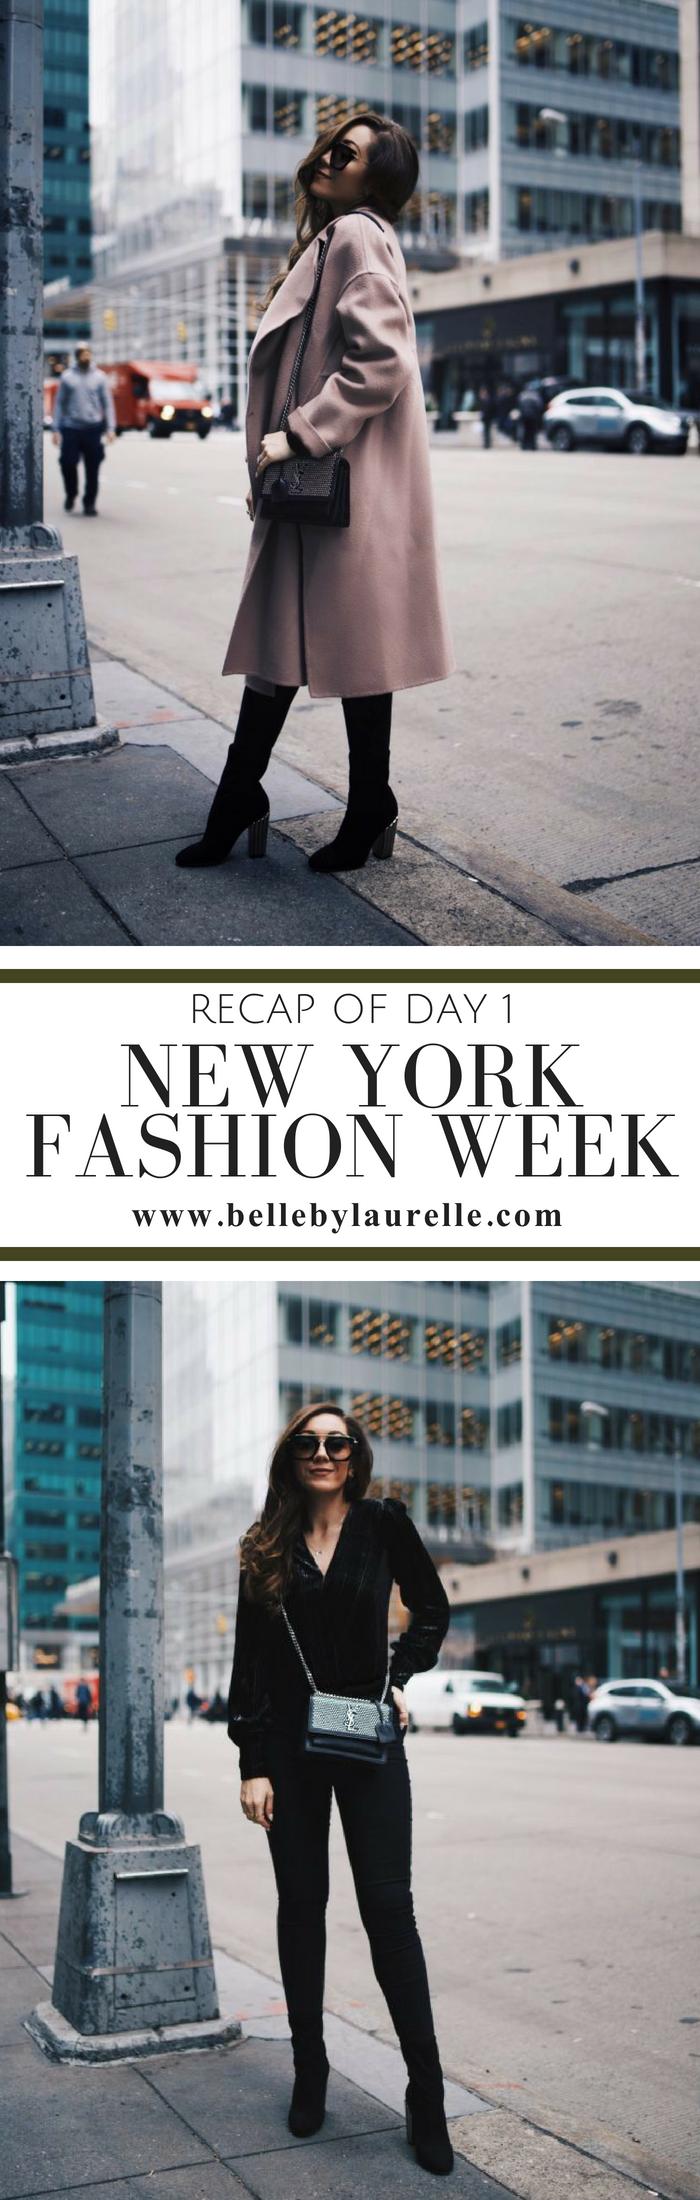 Belle By Laurelle Fashion Week Recap